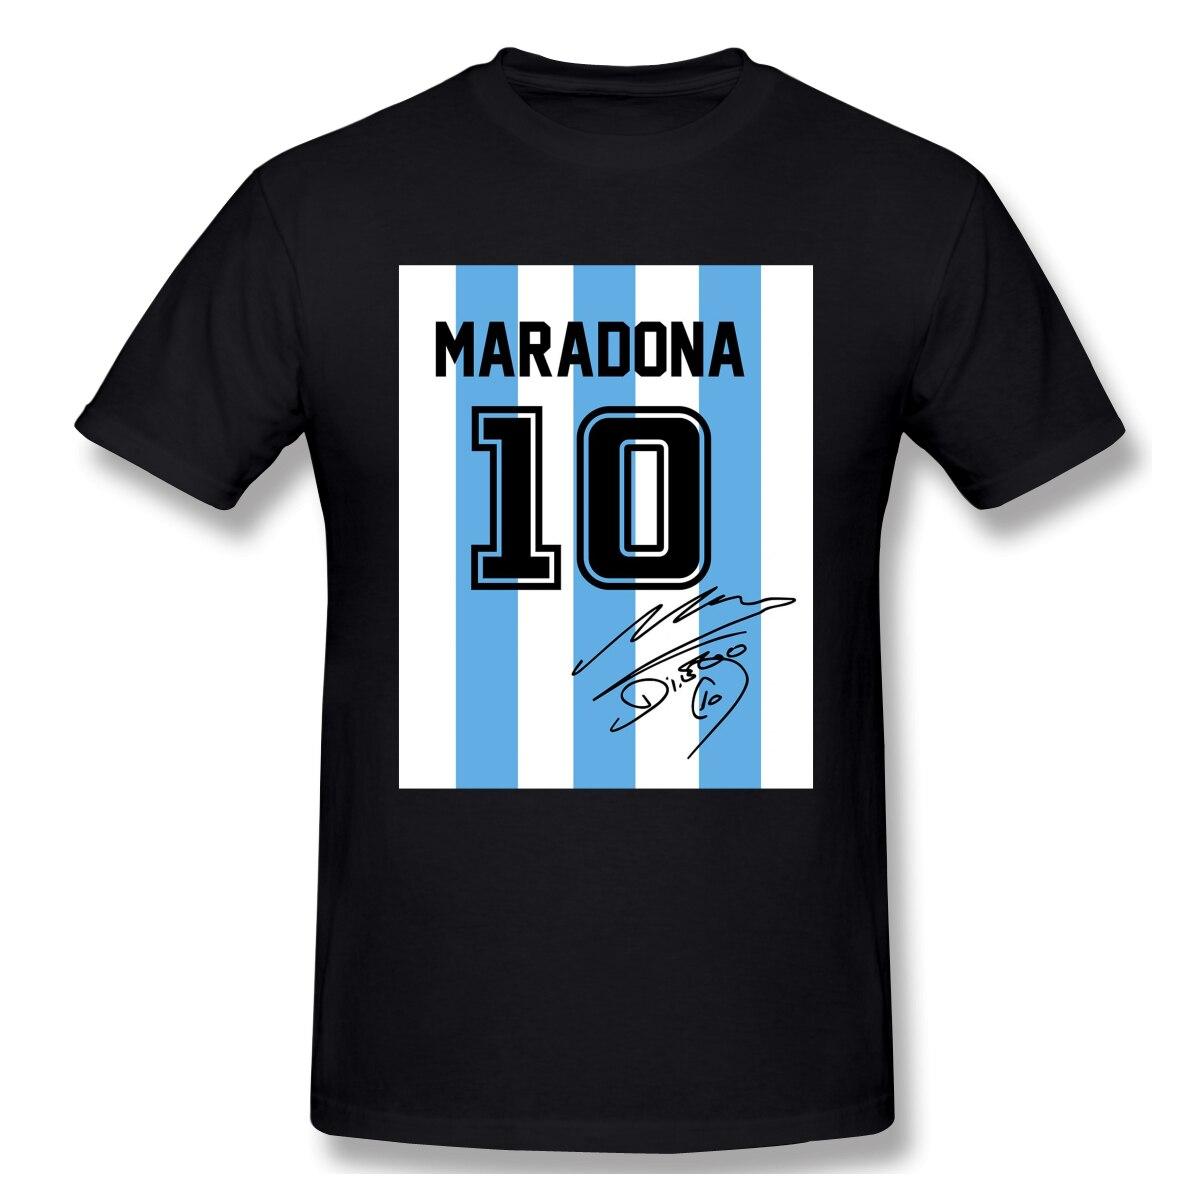 Camiseta de manga corta de algodón para hombre, Camisetas de talla grande...